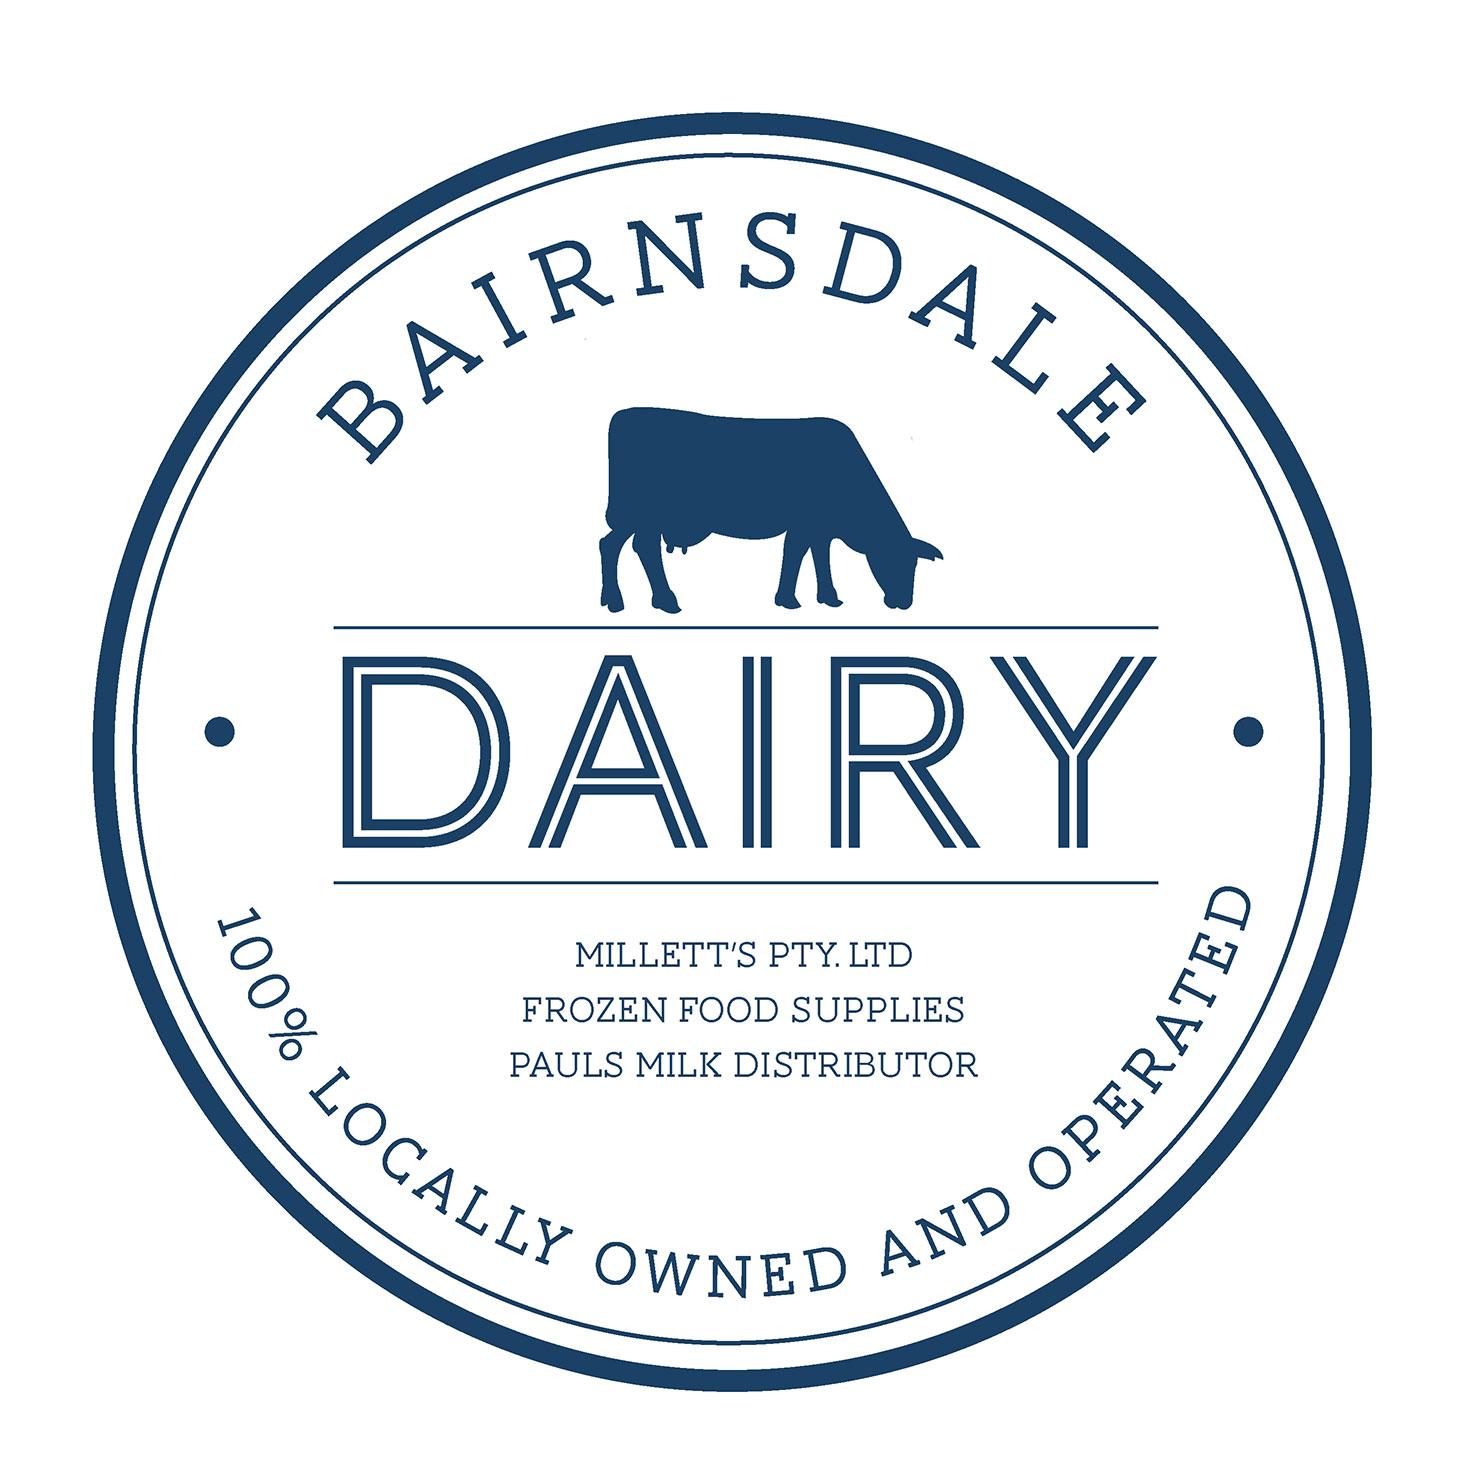 Bairnsdale-Dairy